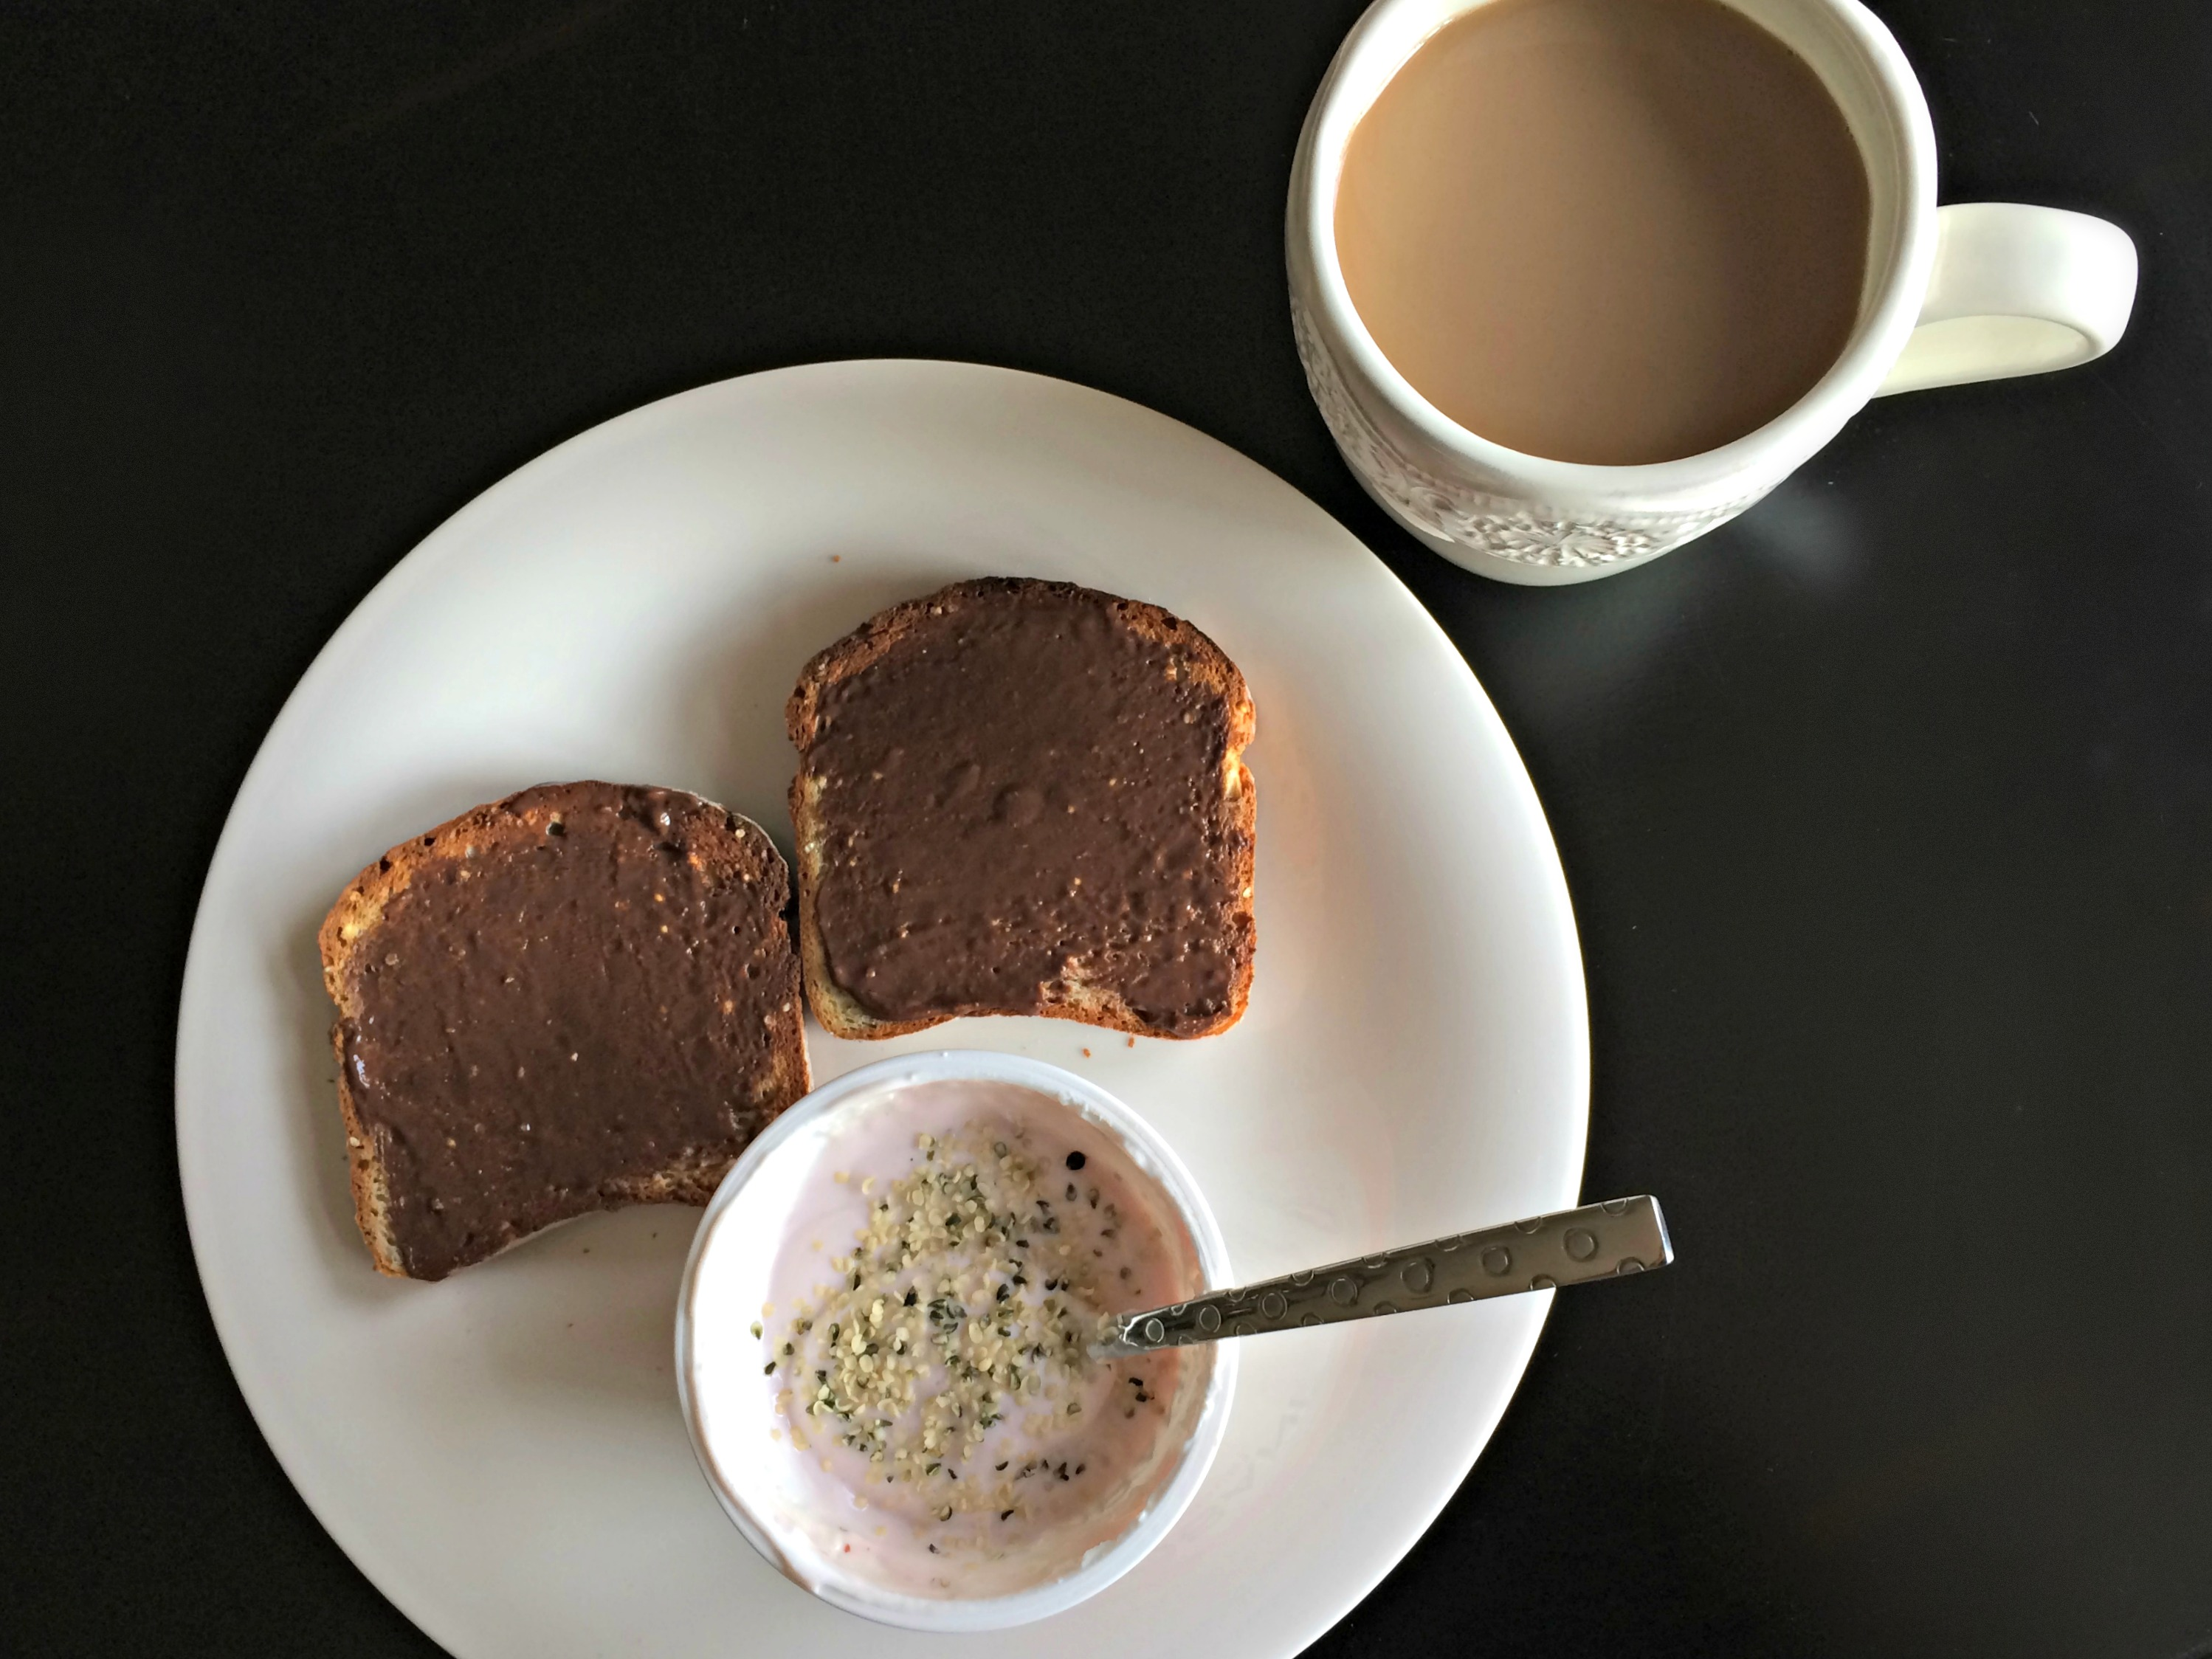 Gluten free toast and greek yogurt